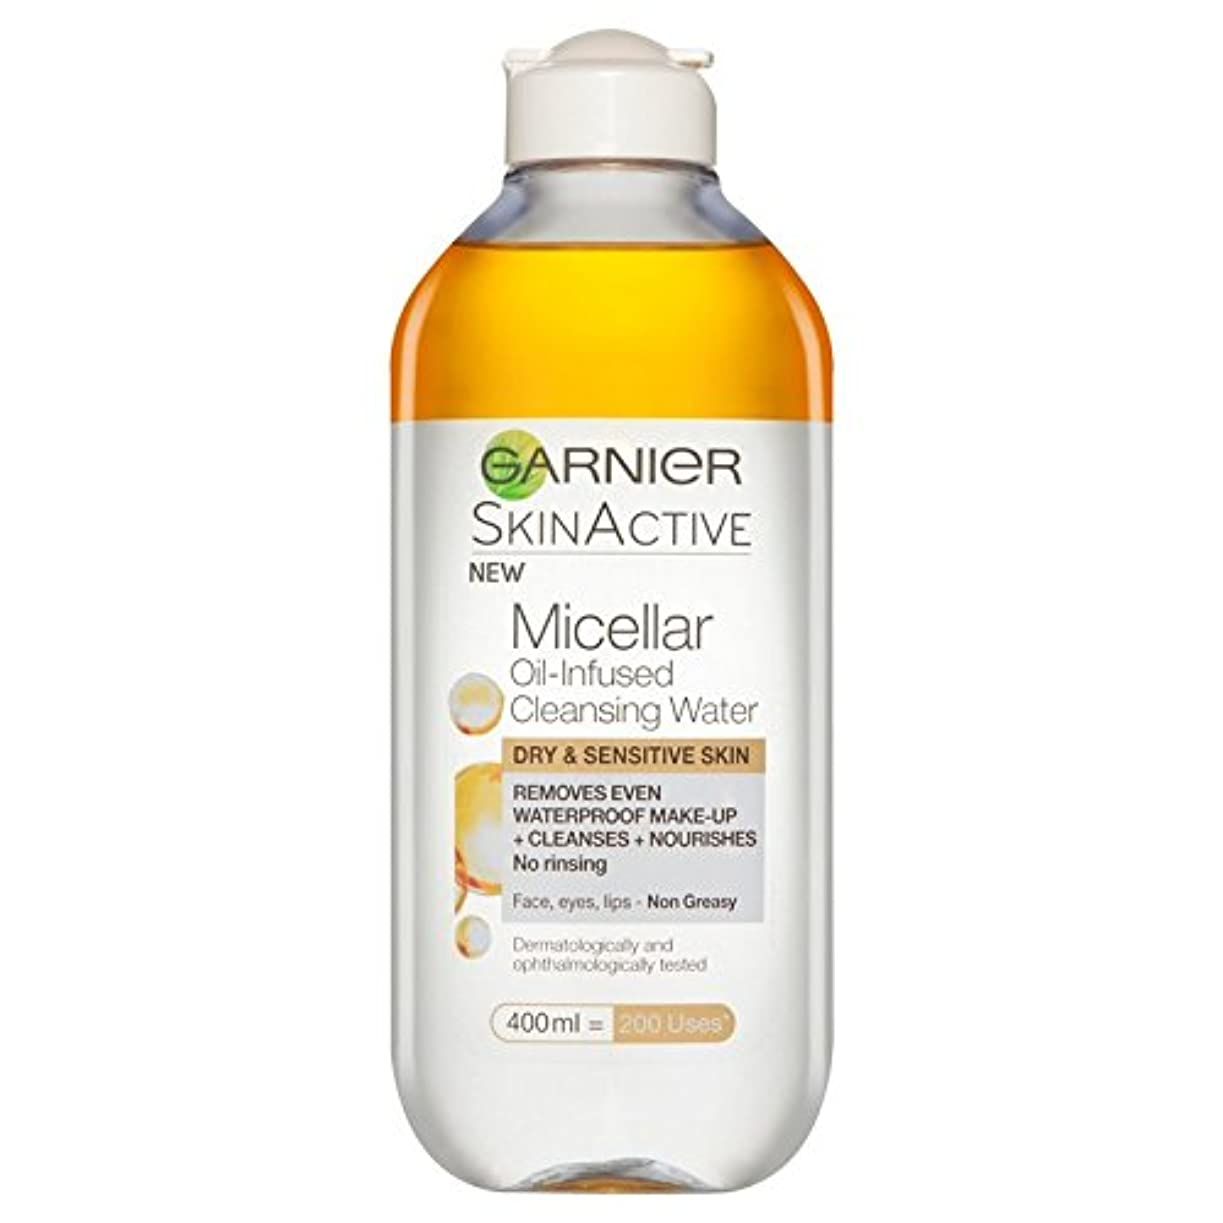 Garnier Skin Naturals Micellar Oil Infused Water (Pack of 6) - ガルニエ肌ナチュラルミセル油注入された水 x6 [並行輸入品]